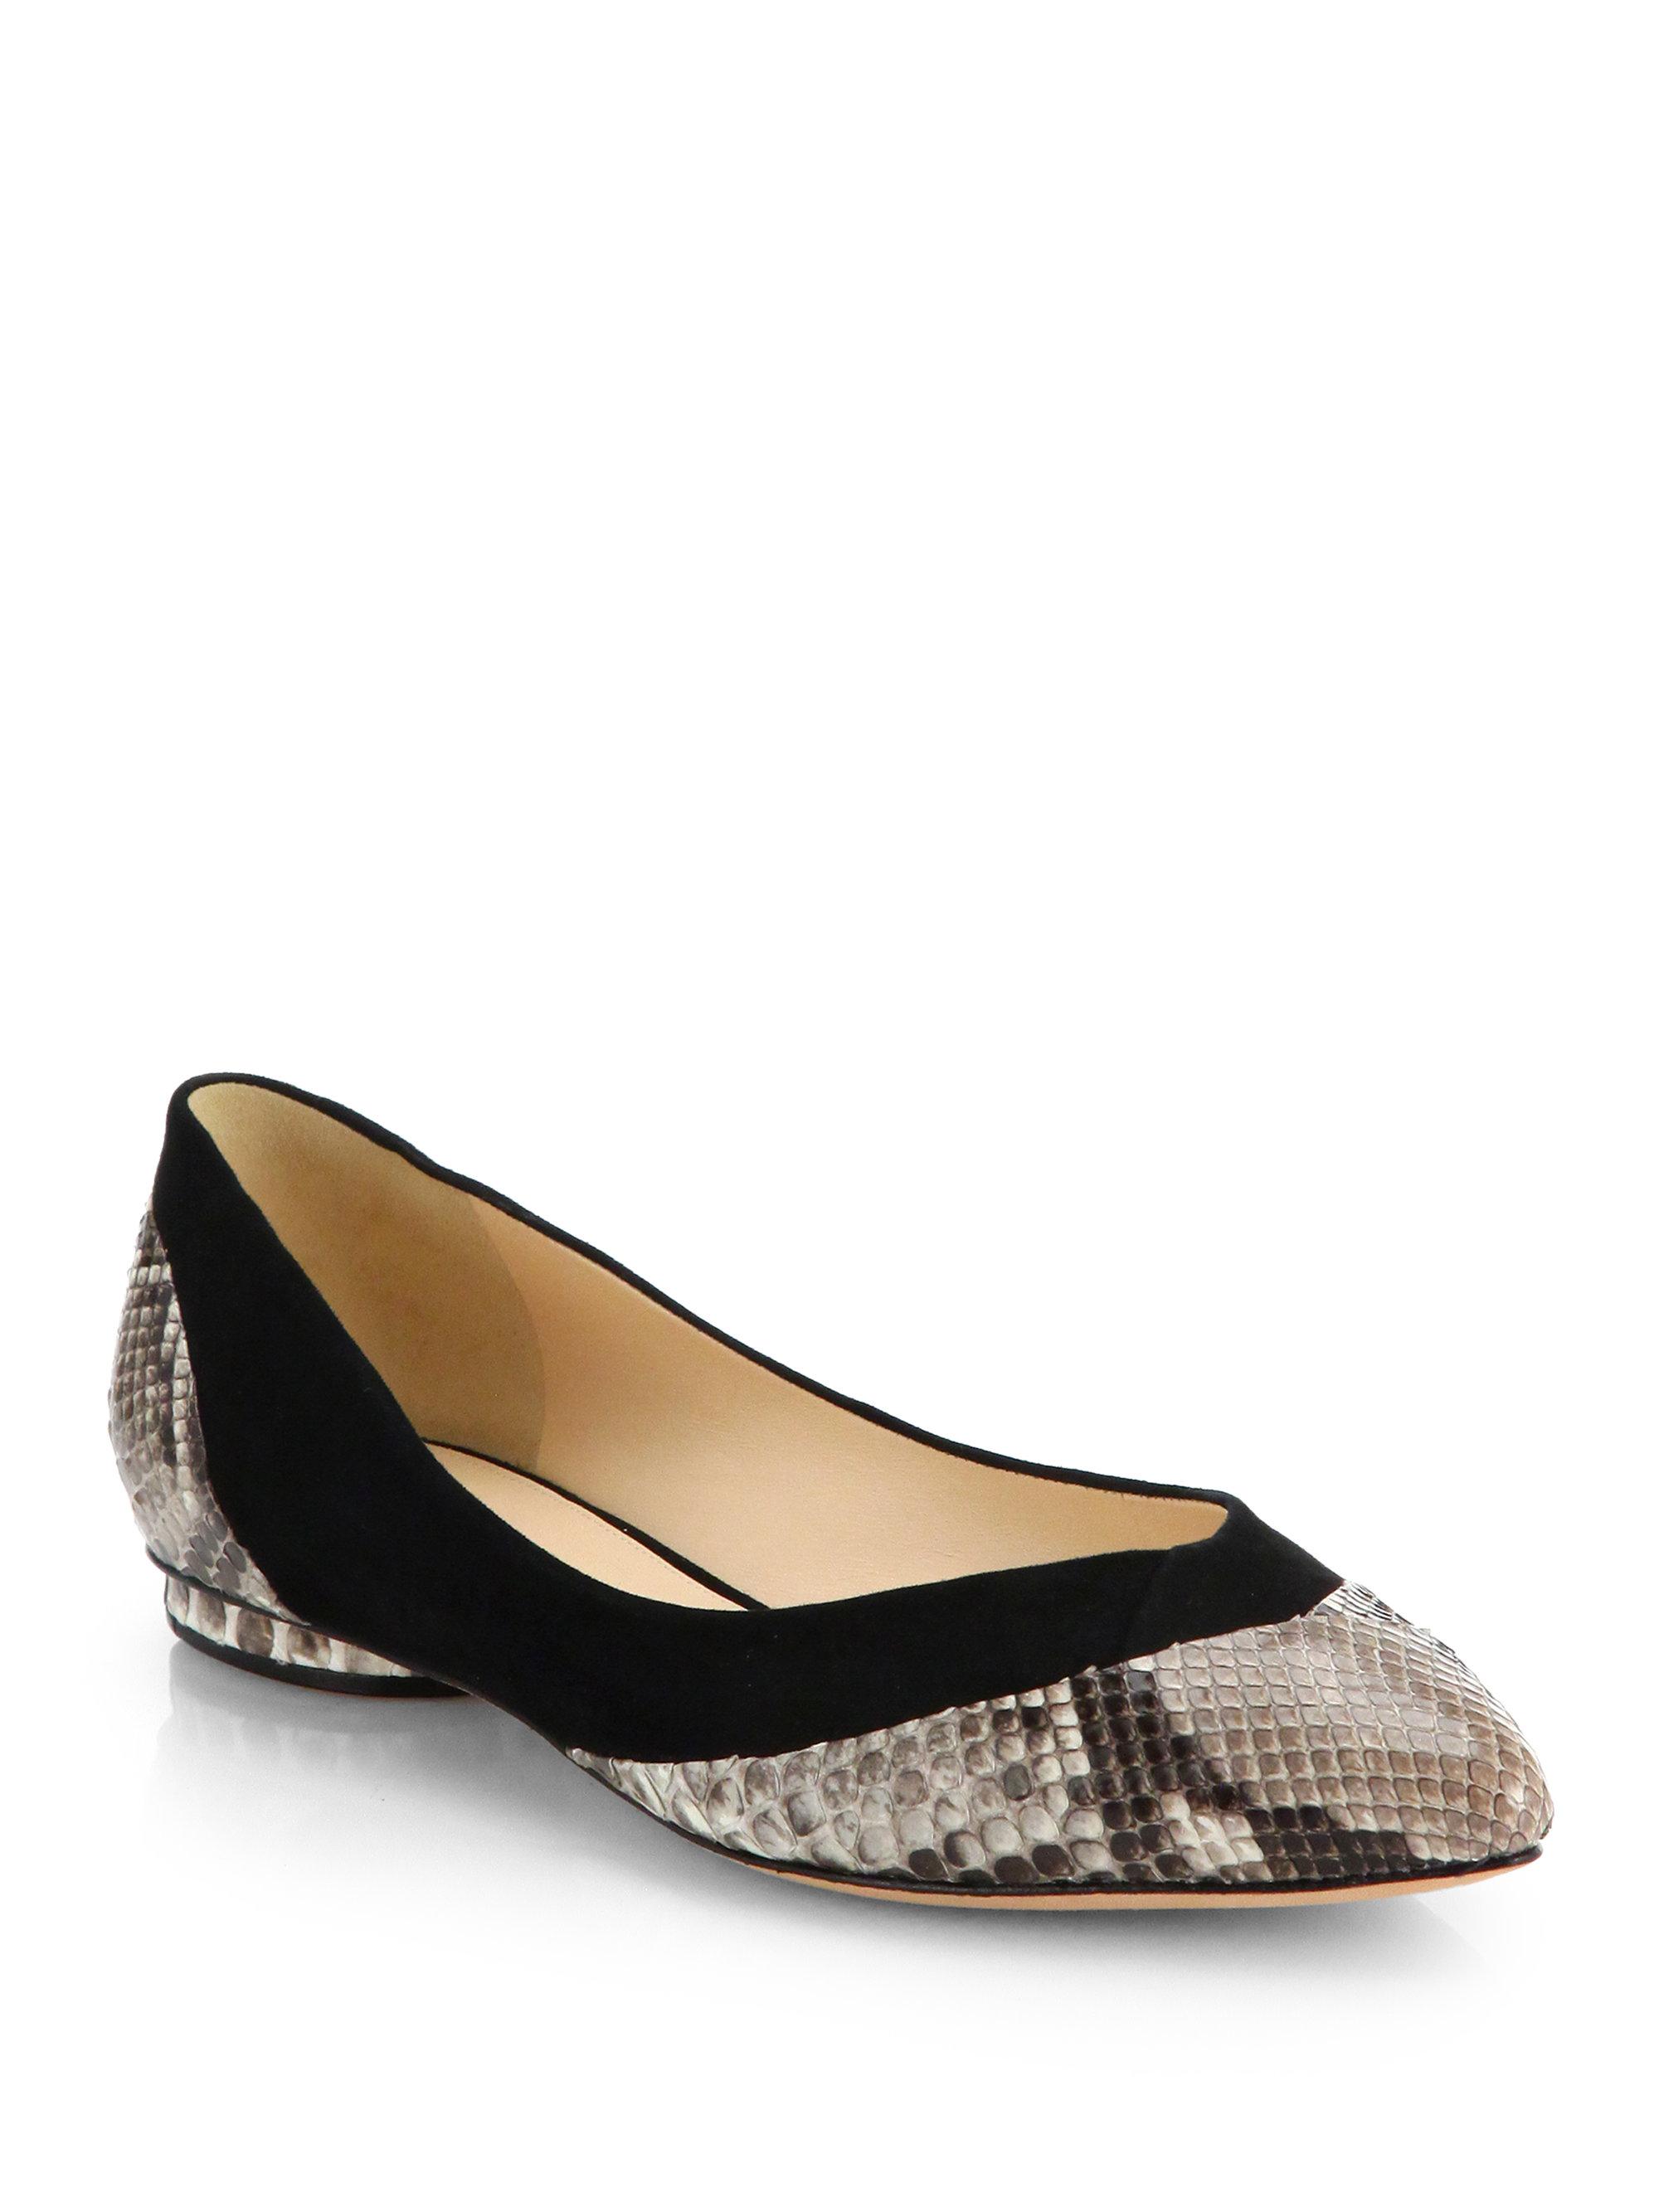 Alexandre Birman Python-Trimmed Suede Flats browse sale online online store jQrxv